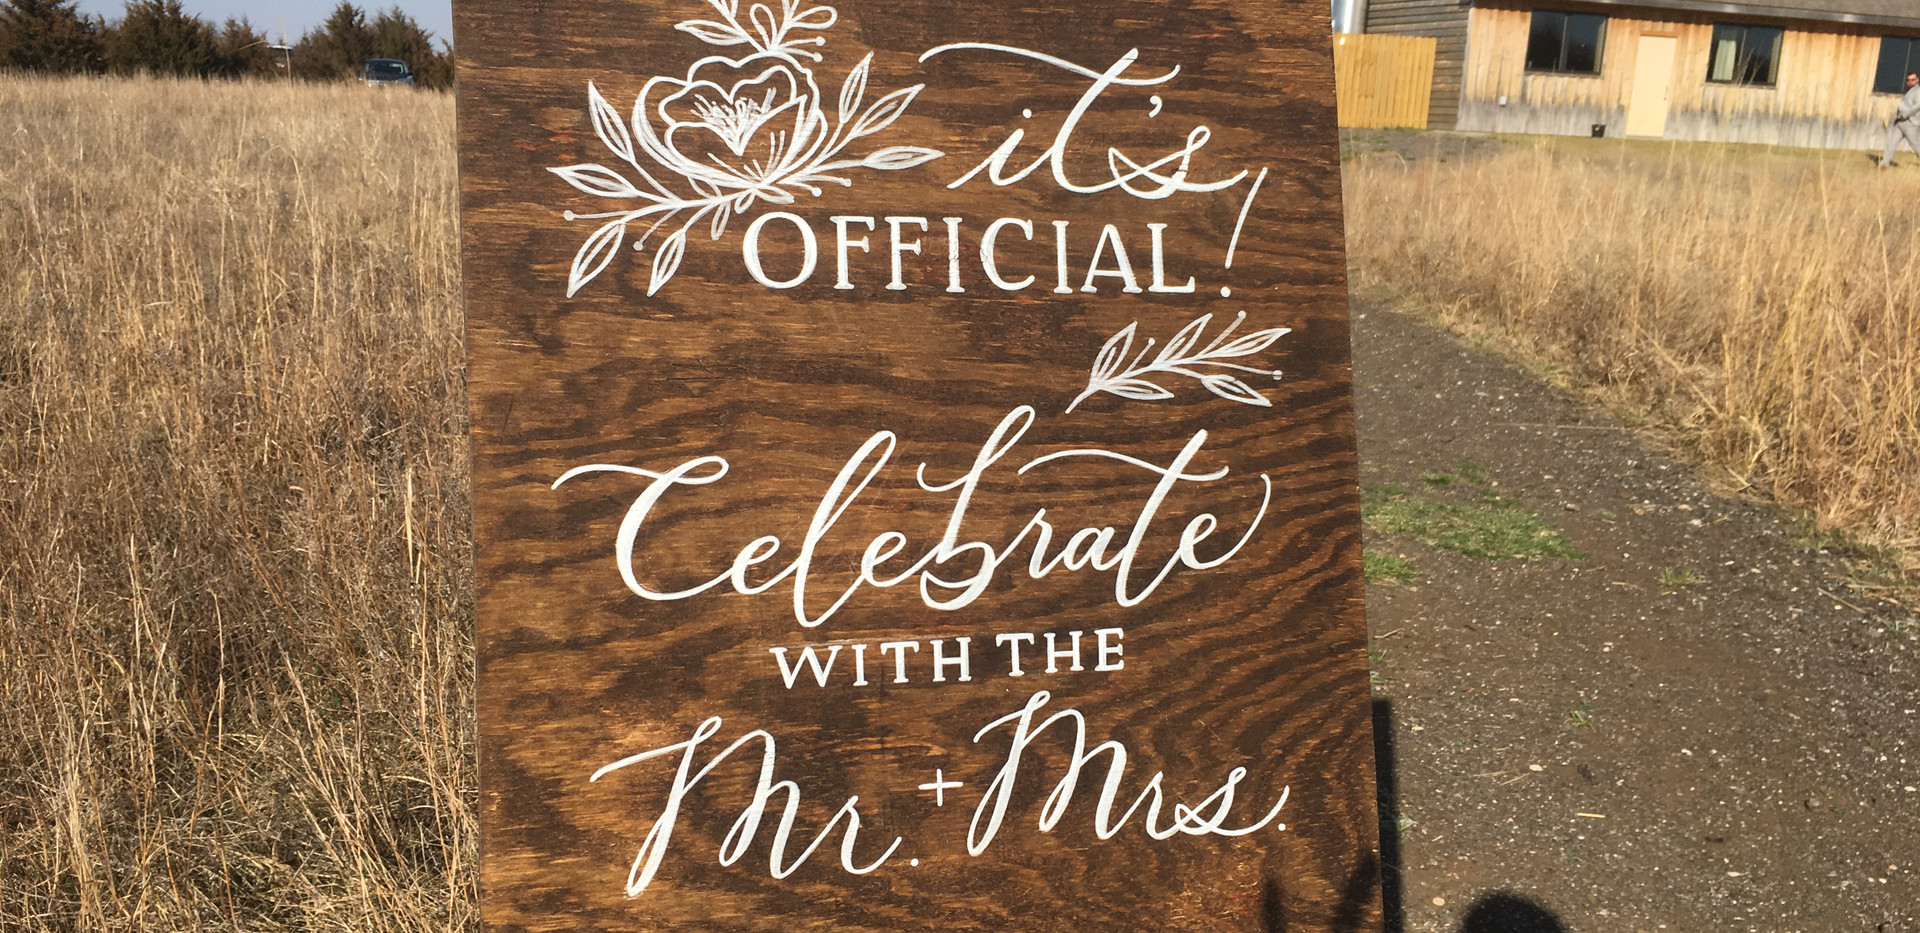 Rustic Wood Reception Sign